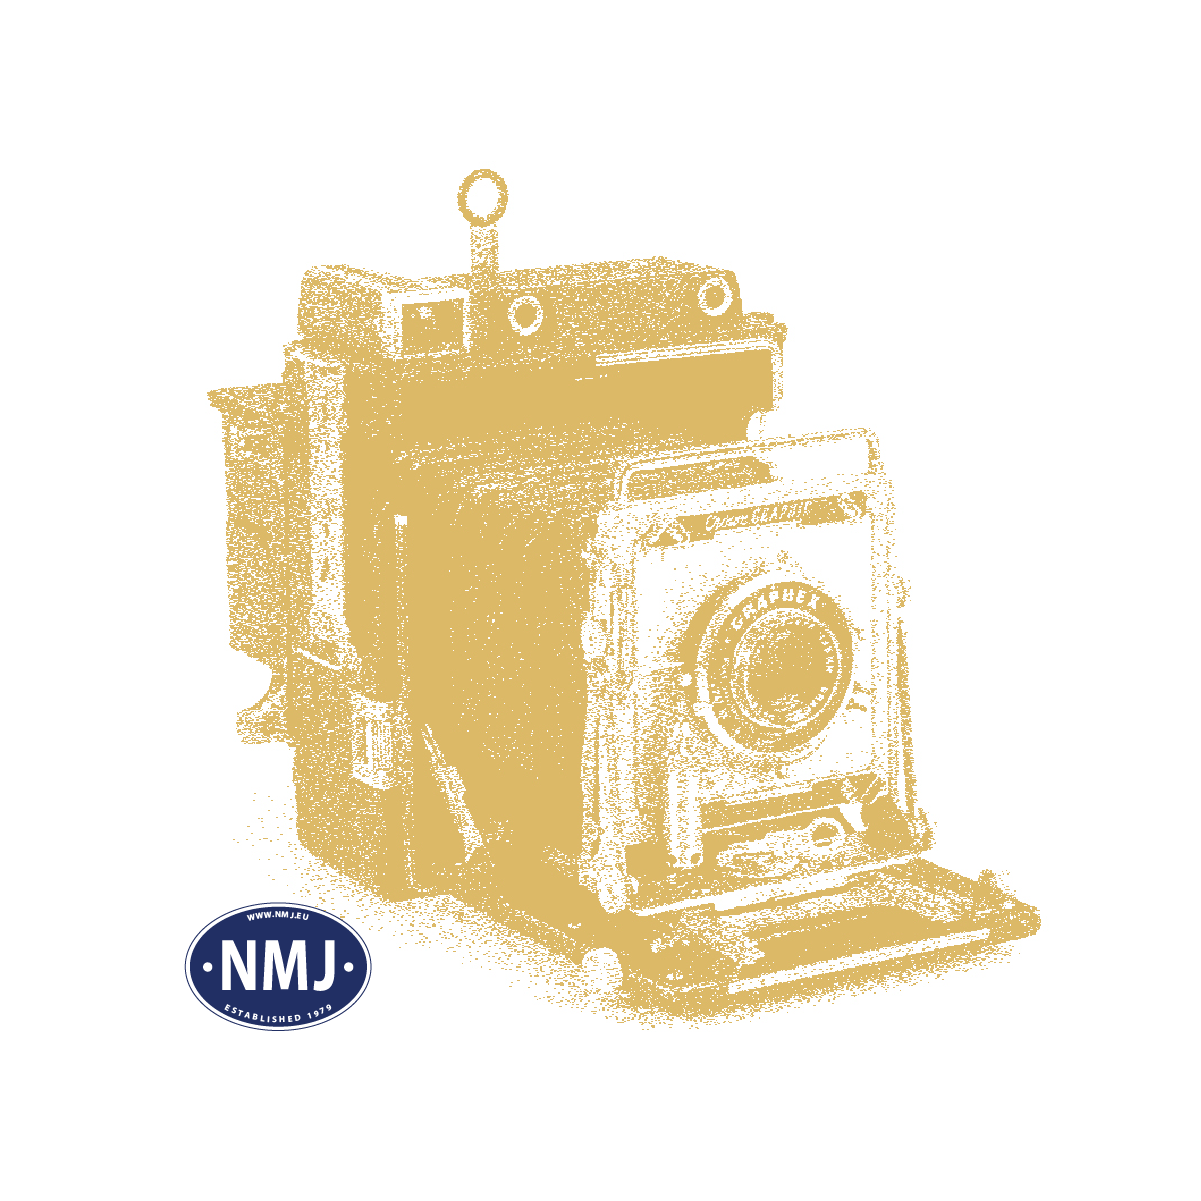 NMJT105.992 - NMJ Topline NSB B3 Strømopptak, 1 par (2 stk)